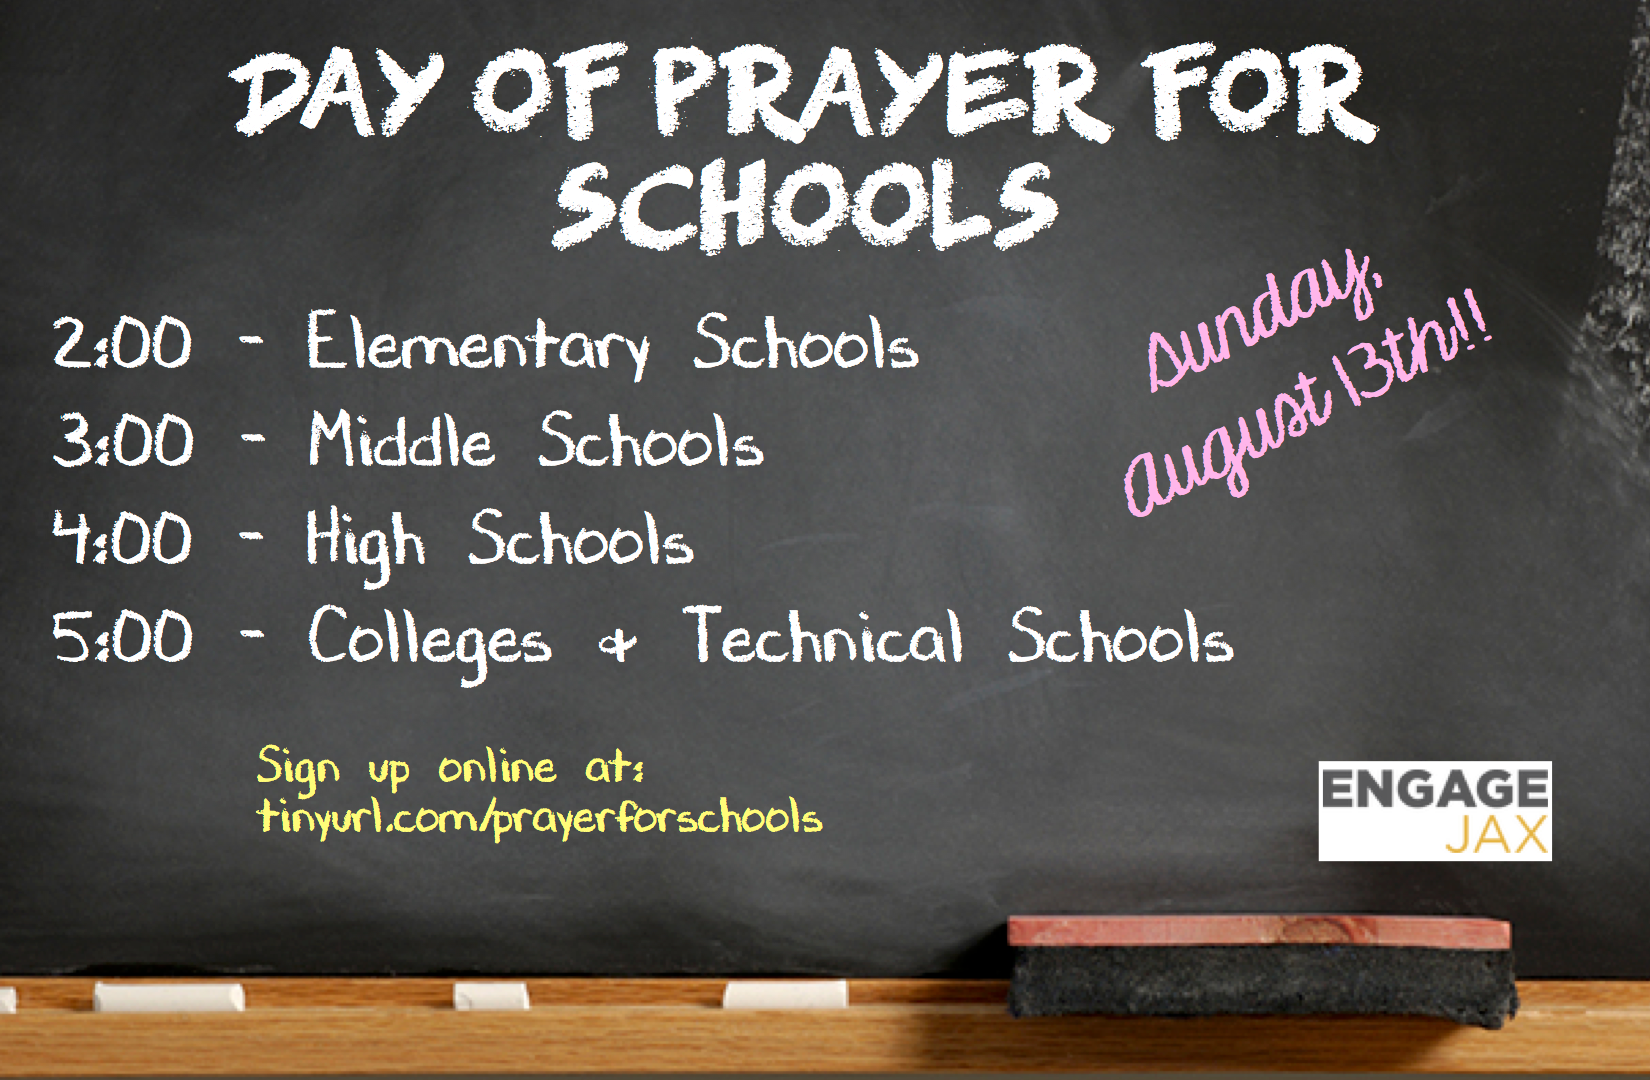 Day of Prayer for Schools 2017